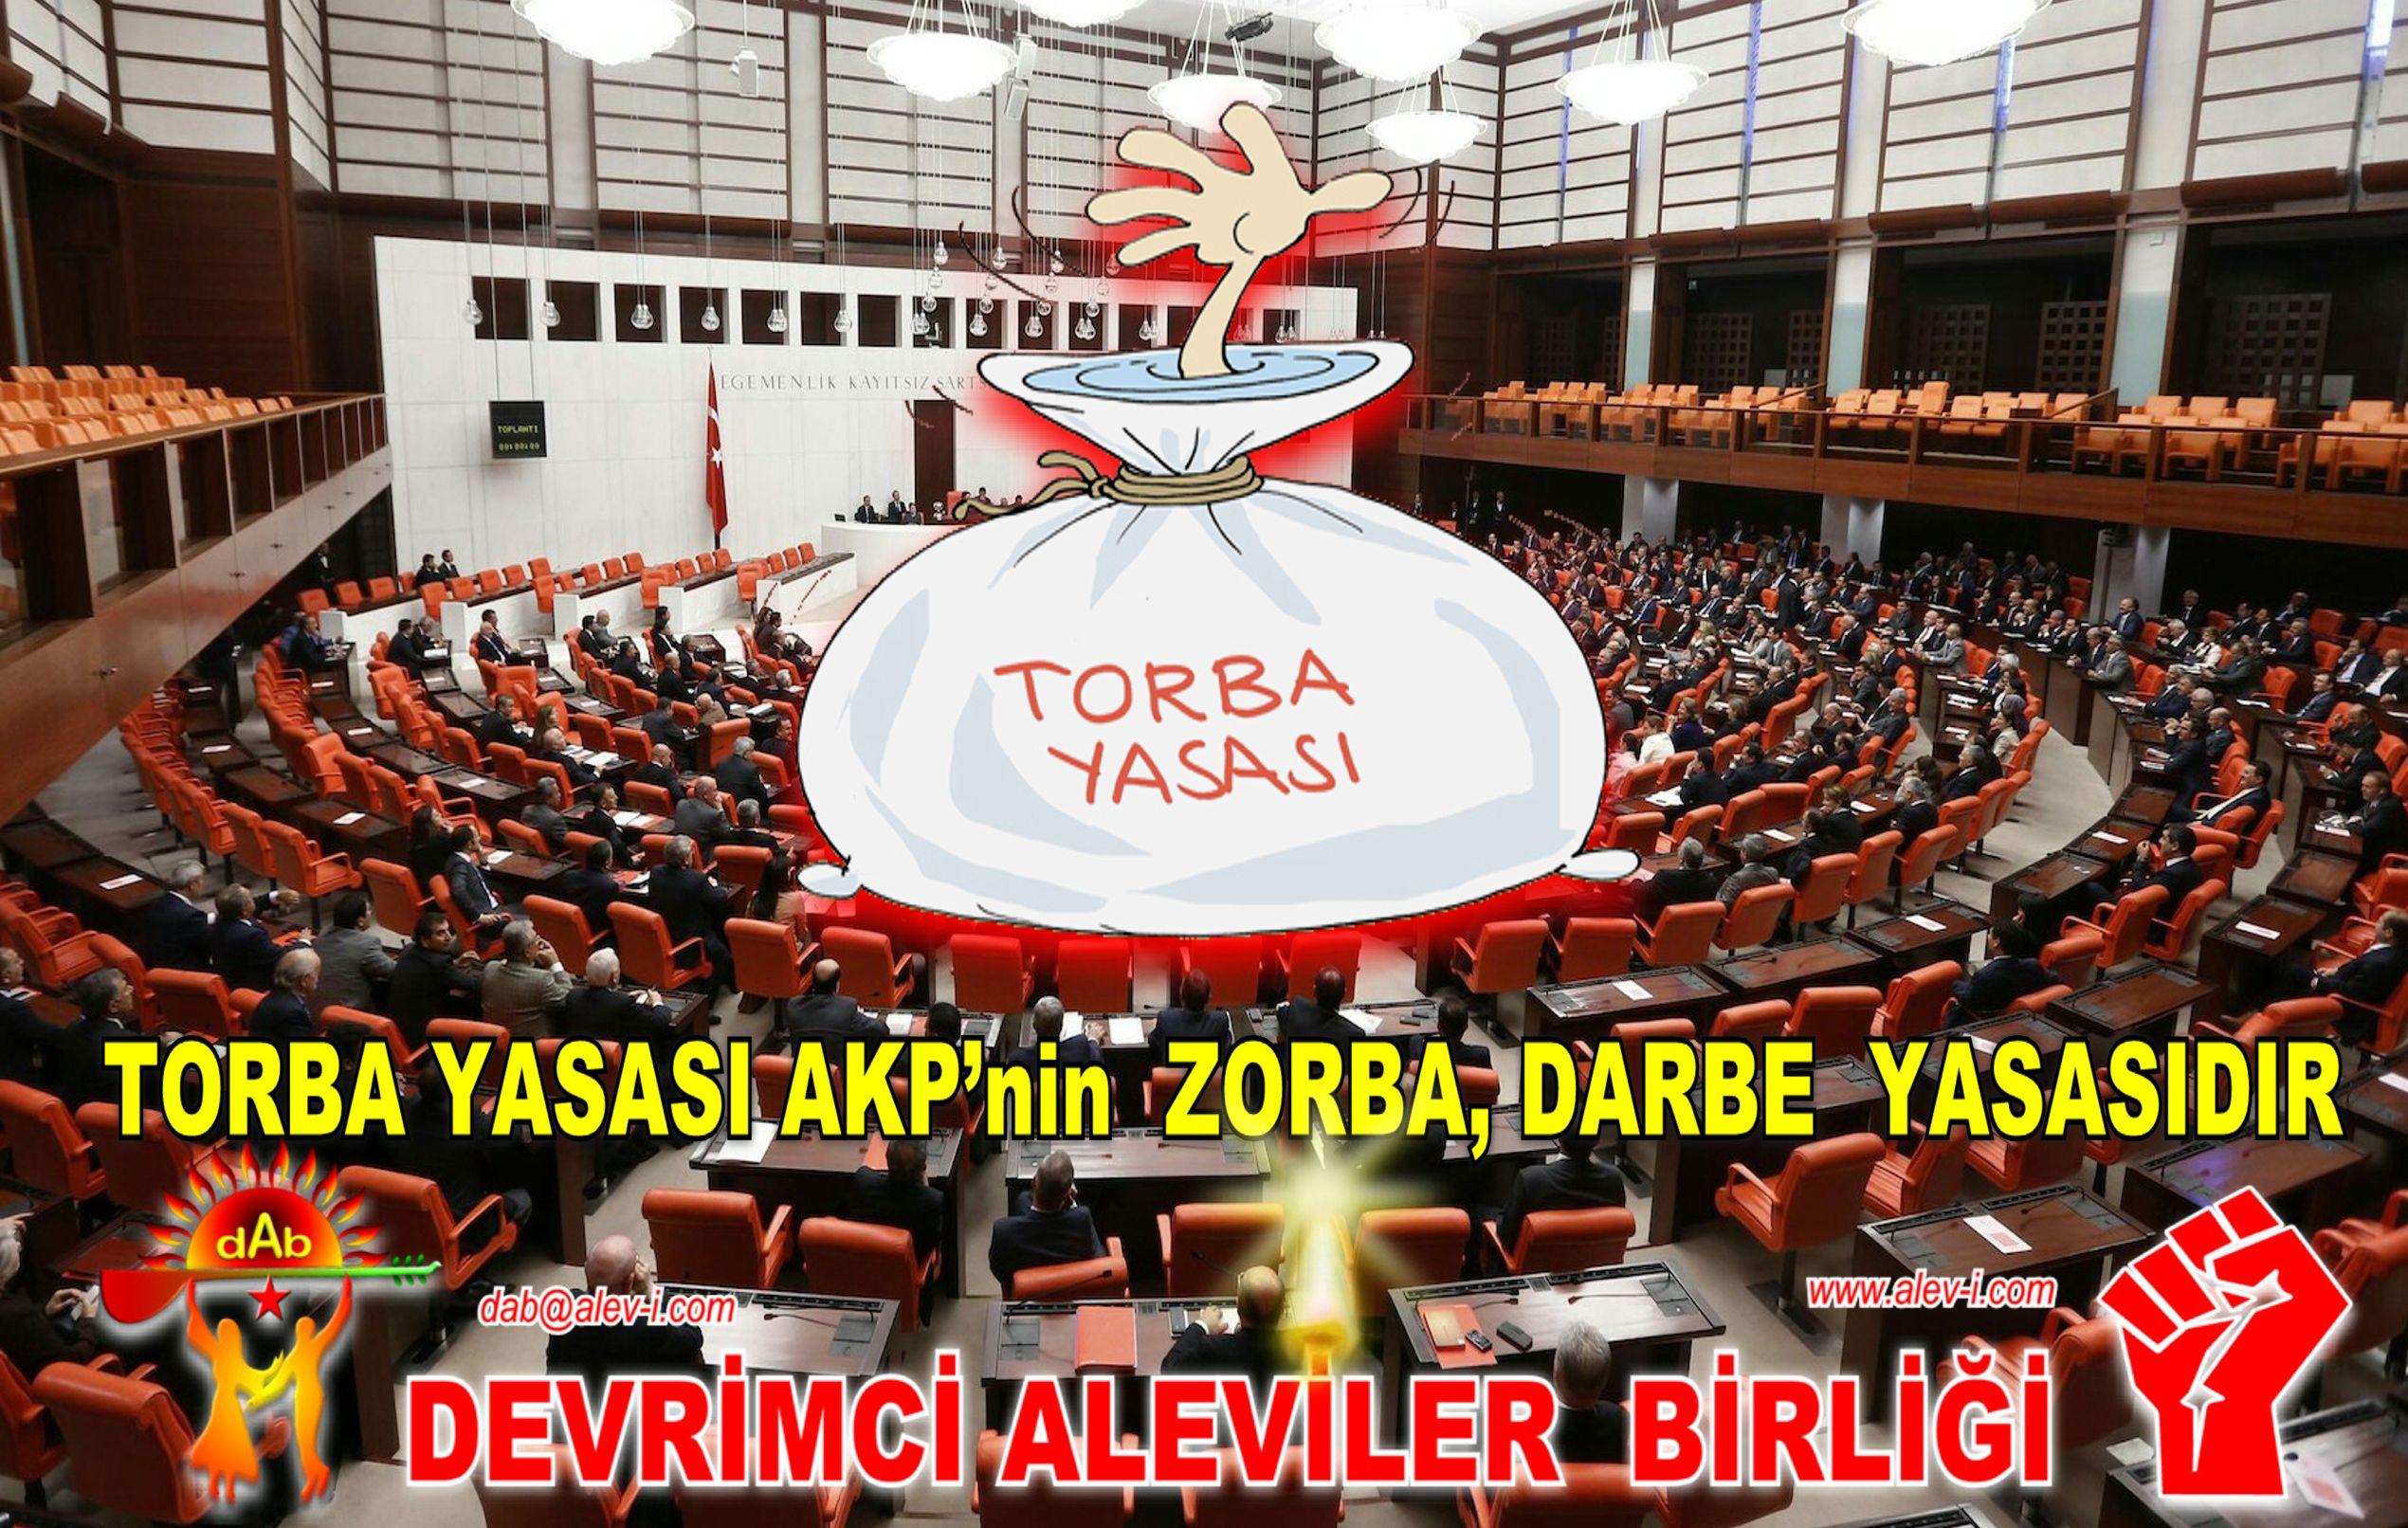 Devrimci Aleviler Birliği DAB Alevi Kızılbaş Bektaşi pir sultan cem hz Ali 12 imam semah Feramuz Şah Acar TOBA ZORBA DARBE